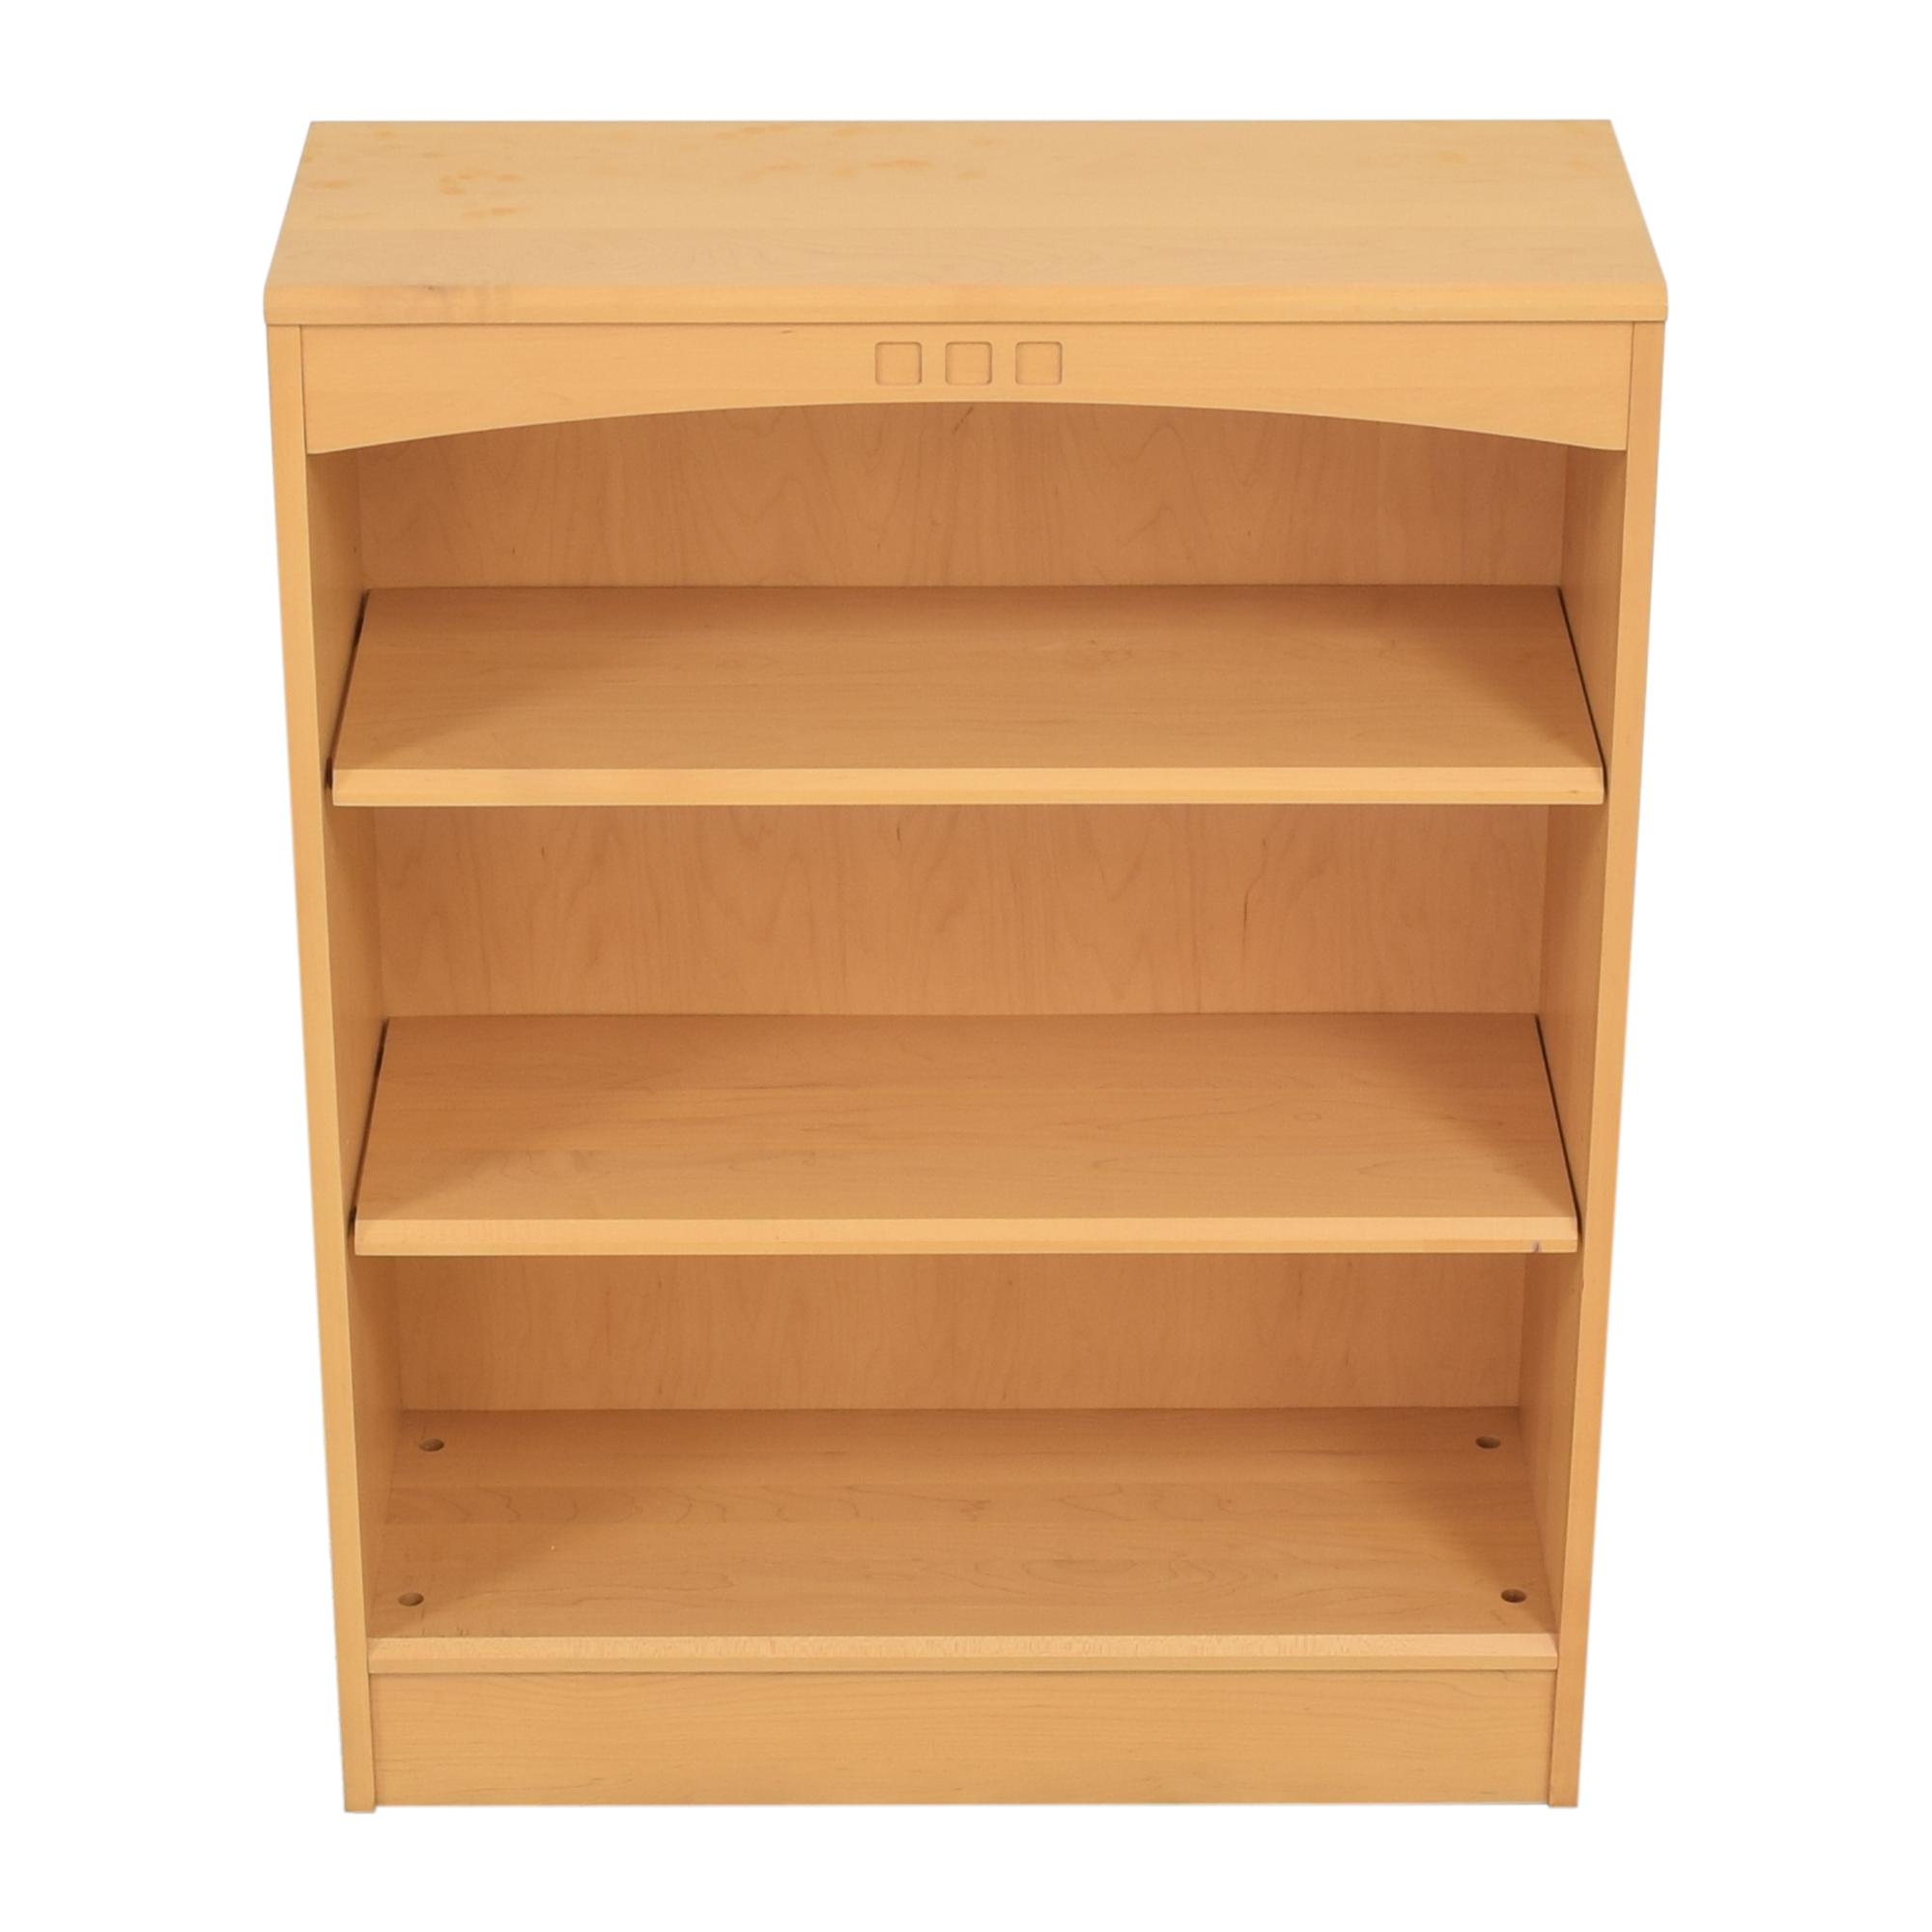 buy Ethan Allen American Dimensions Bookshelf Ethan Allen Bookcases & Shelving